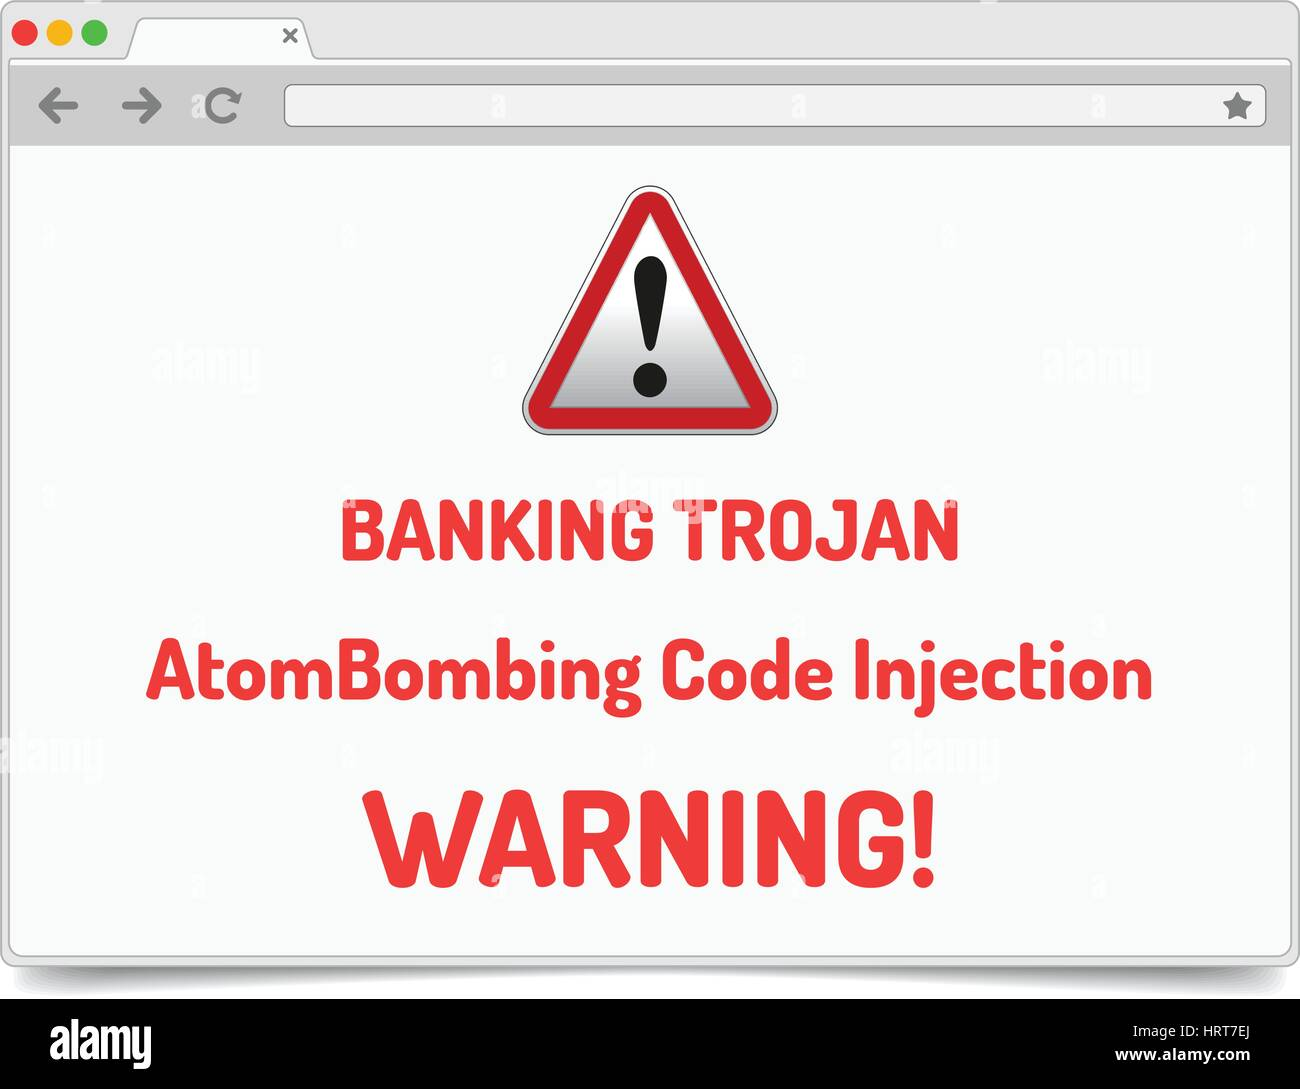 Banking Trojan - Warning sign - bank account hacking, email